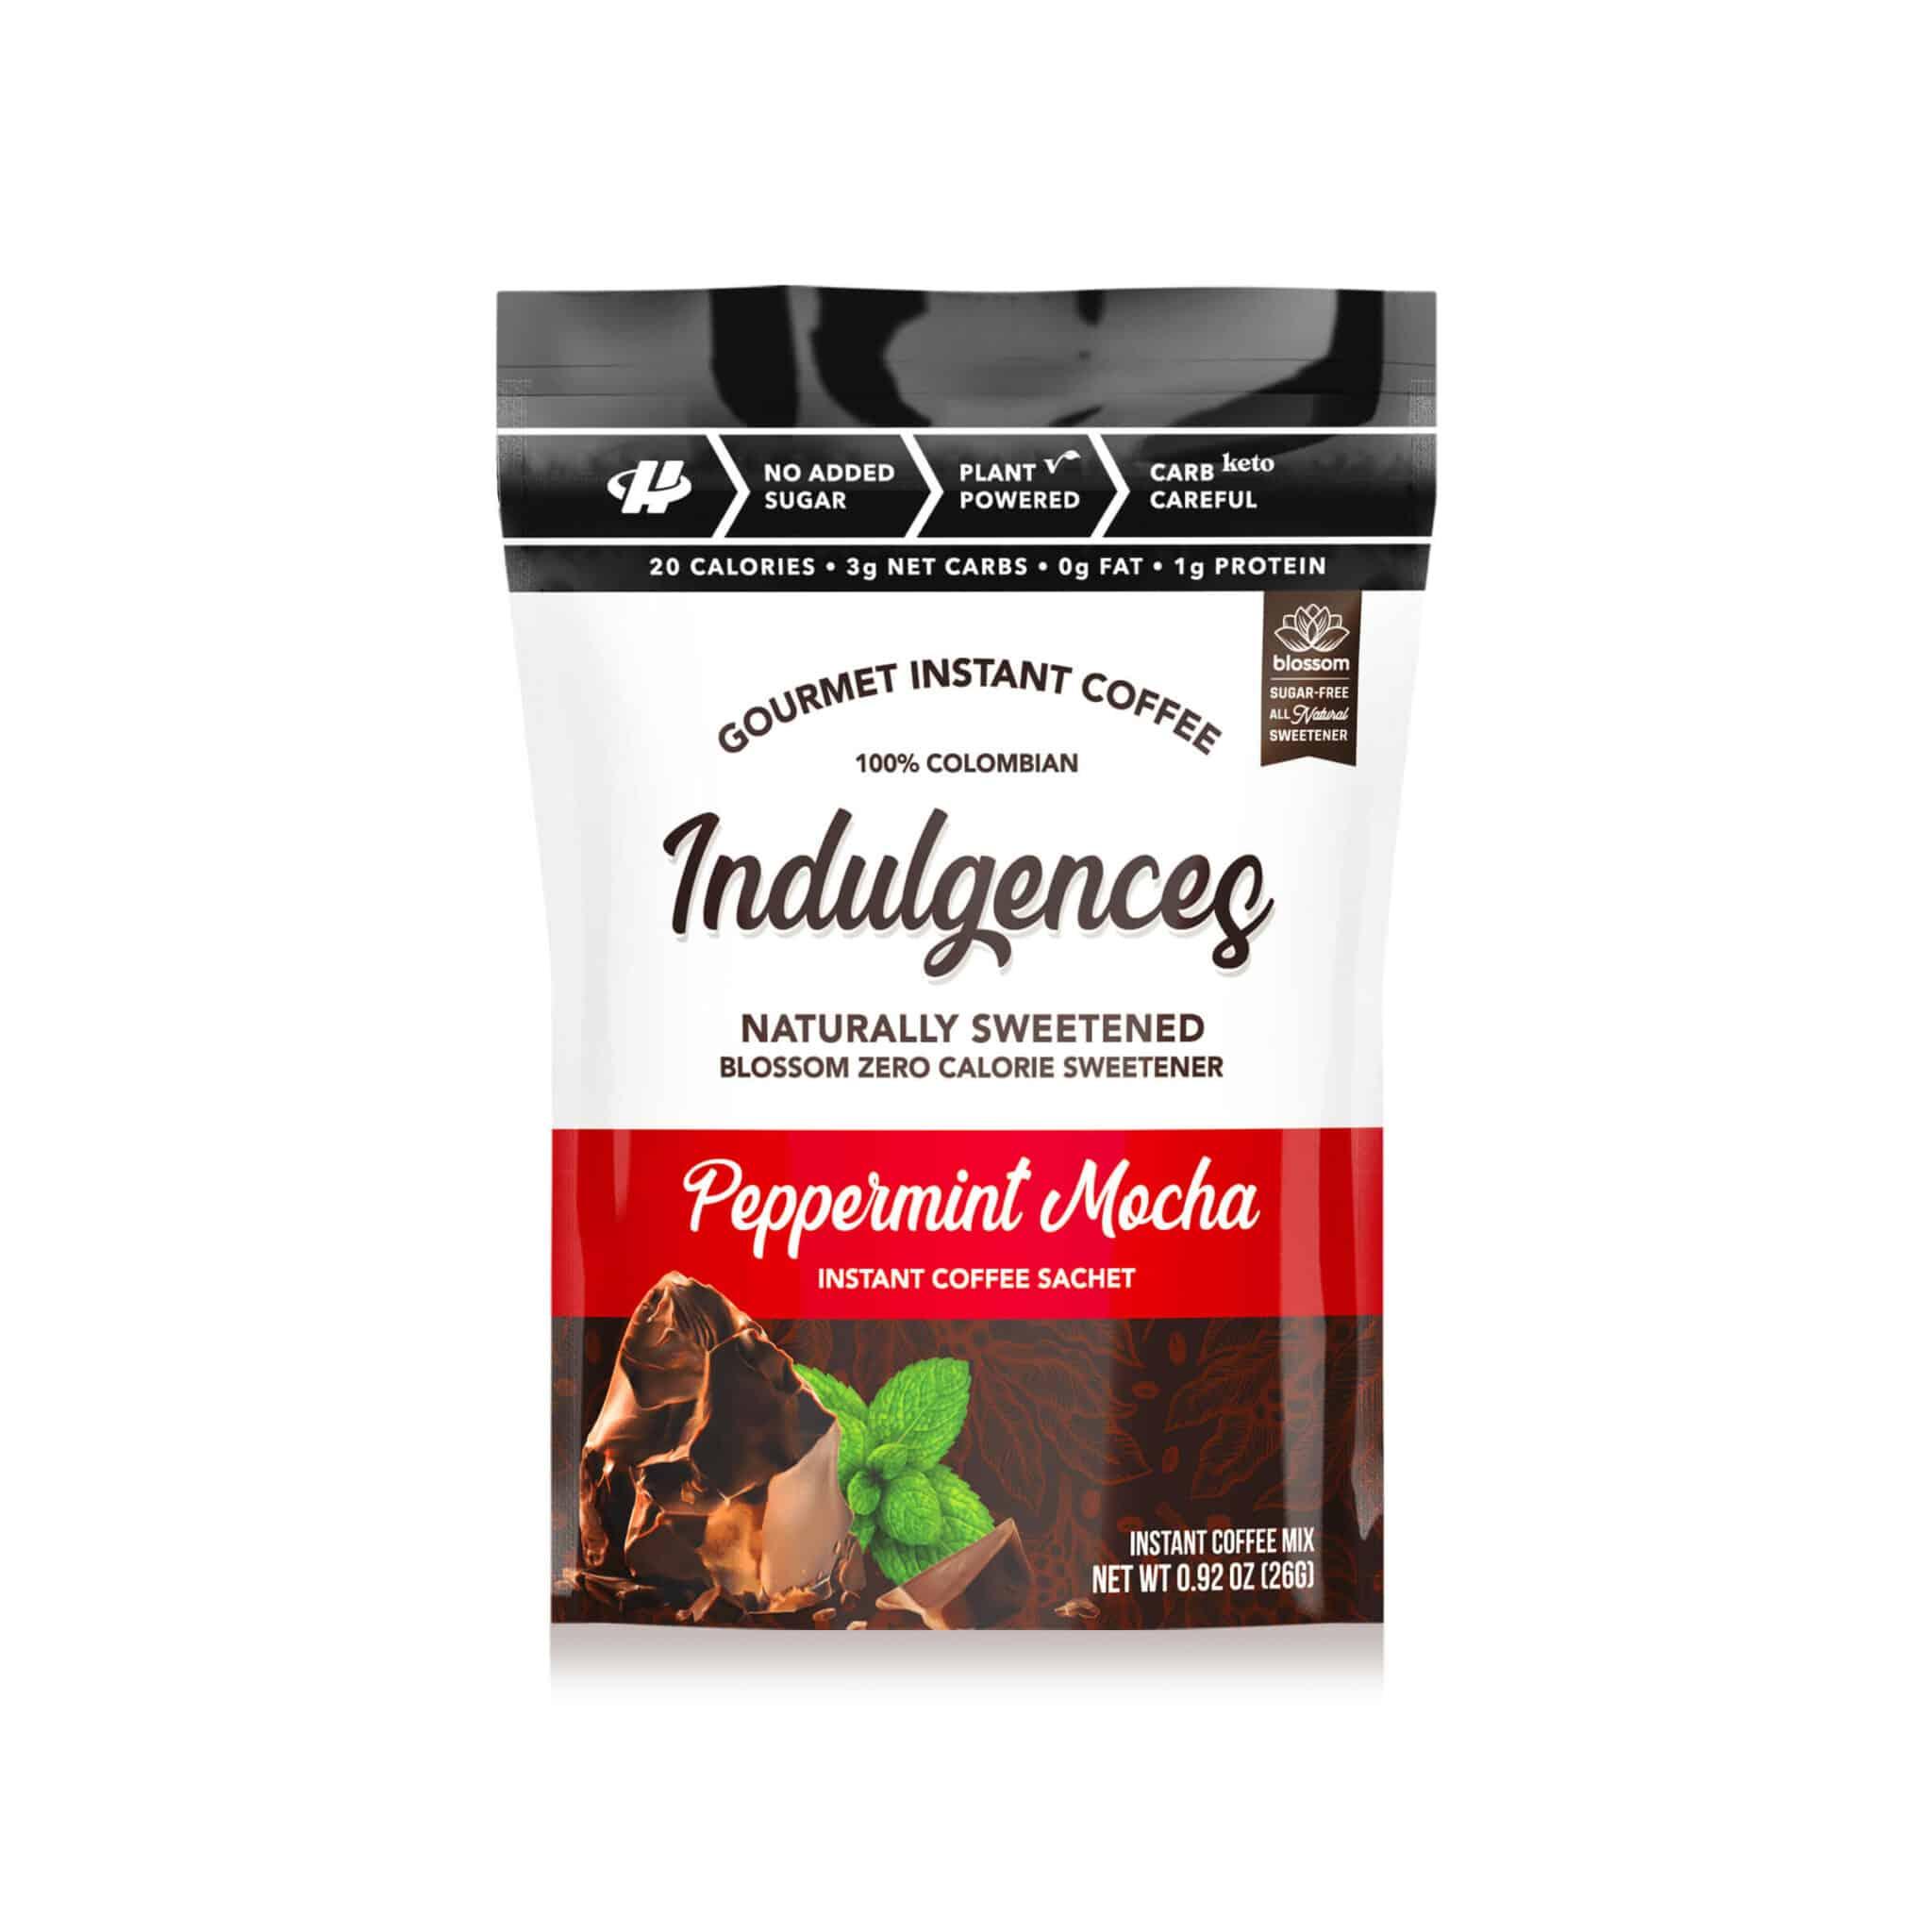 Indulgences-Peppermint-Mocha-Coffee-scaled